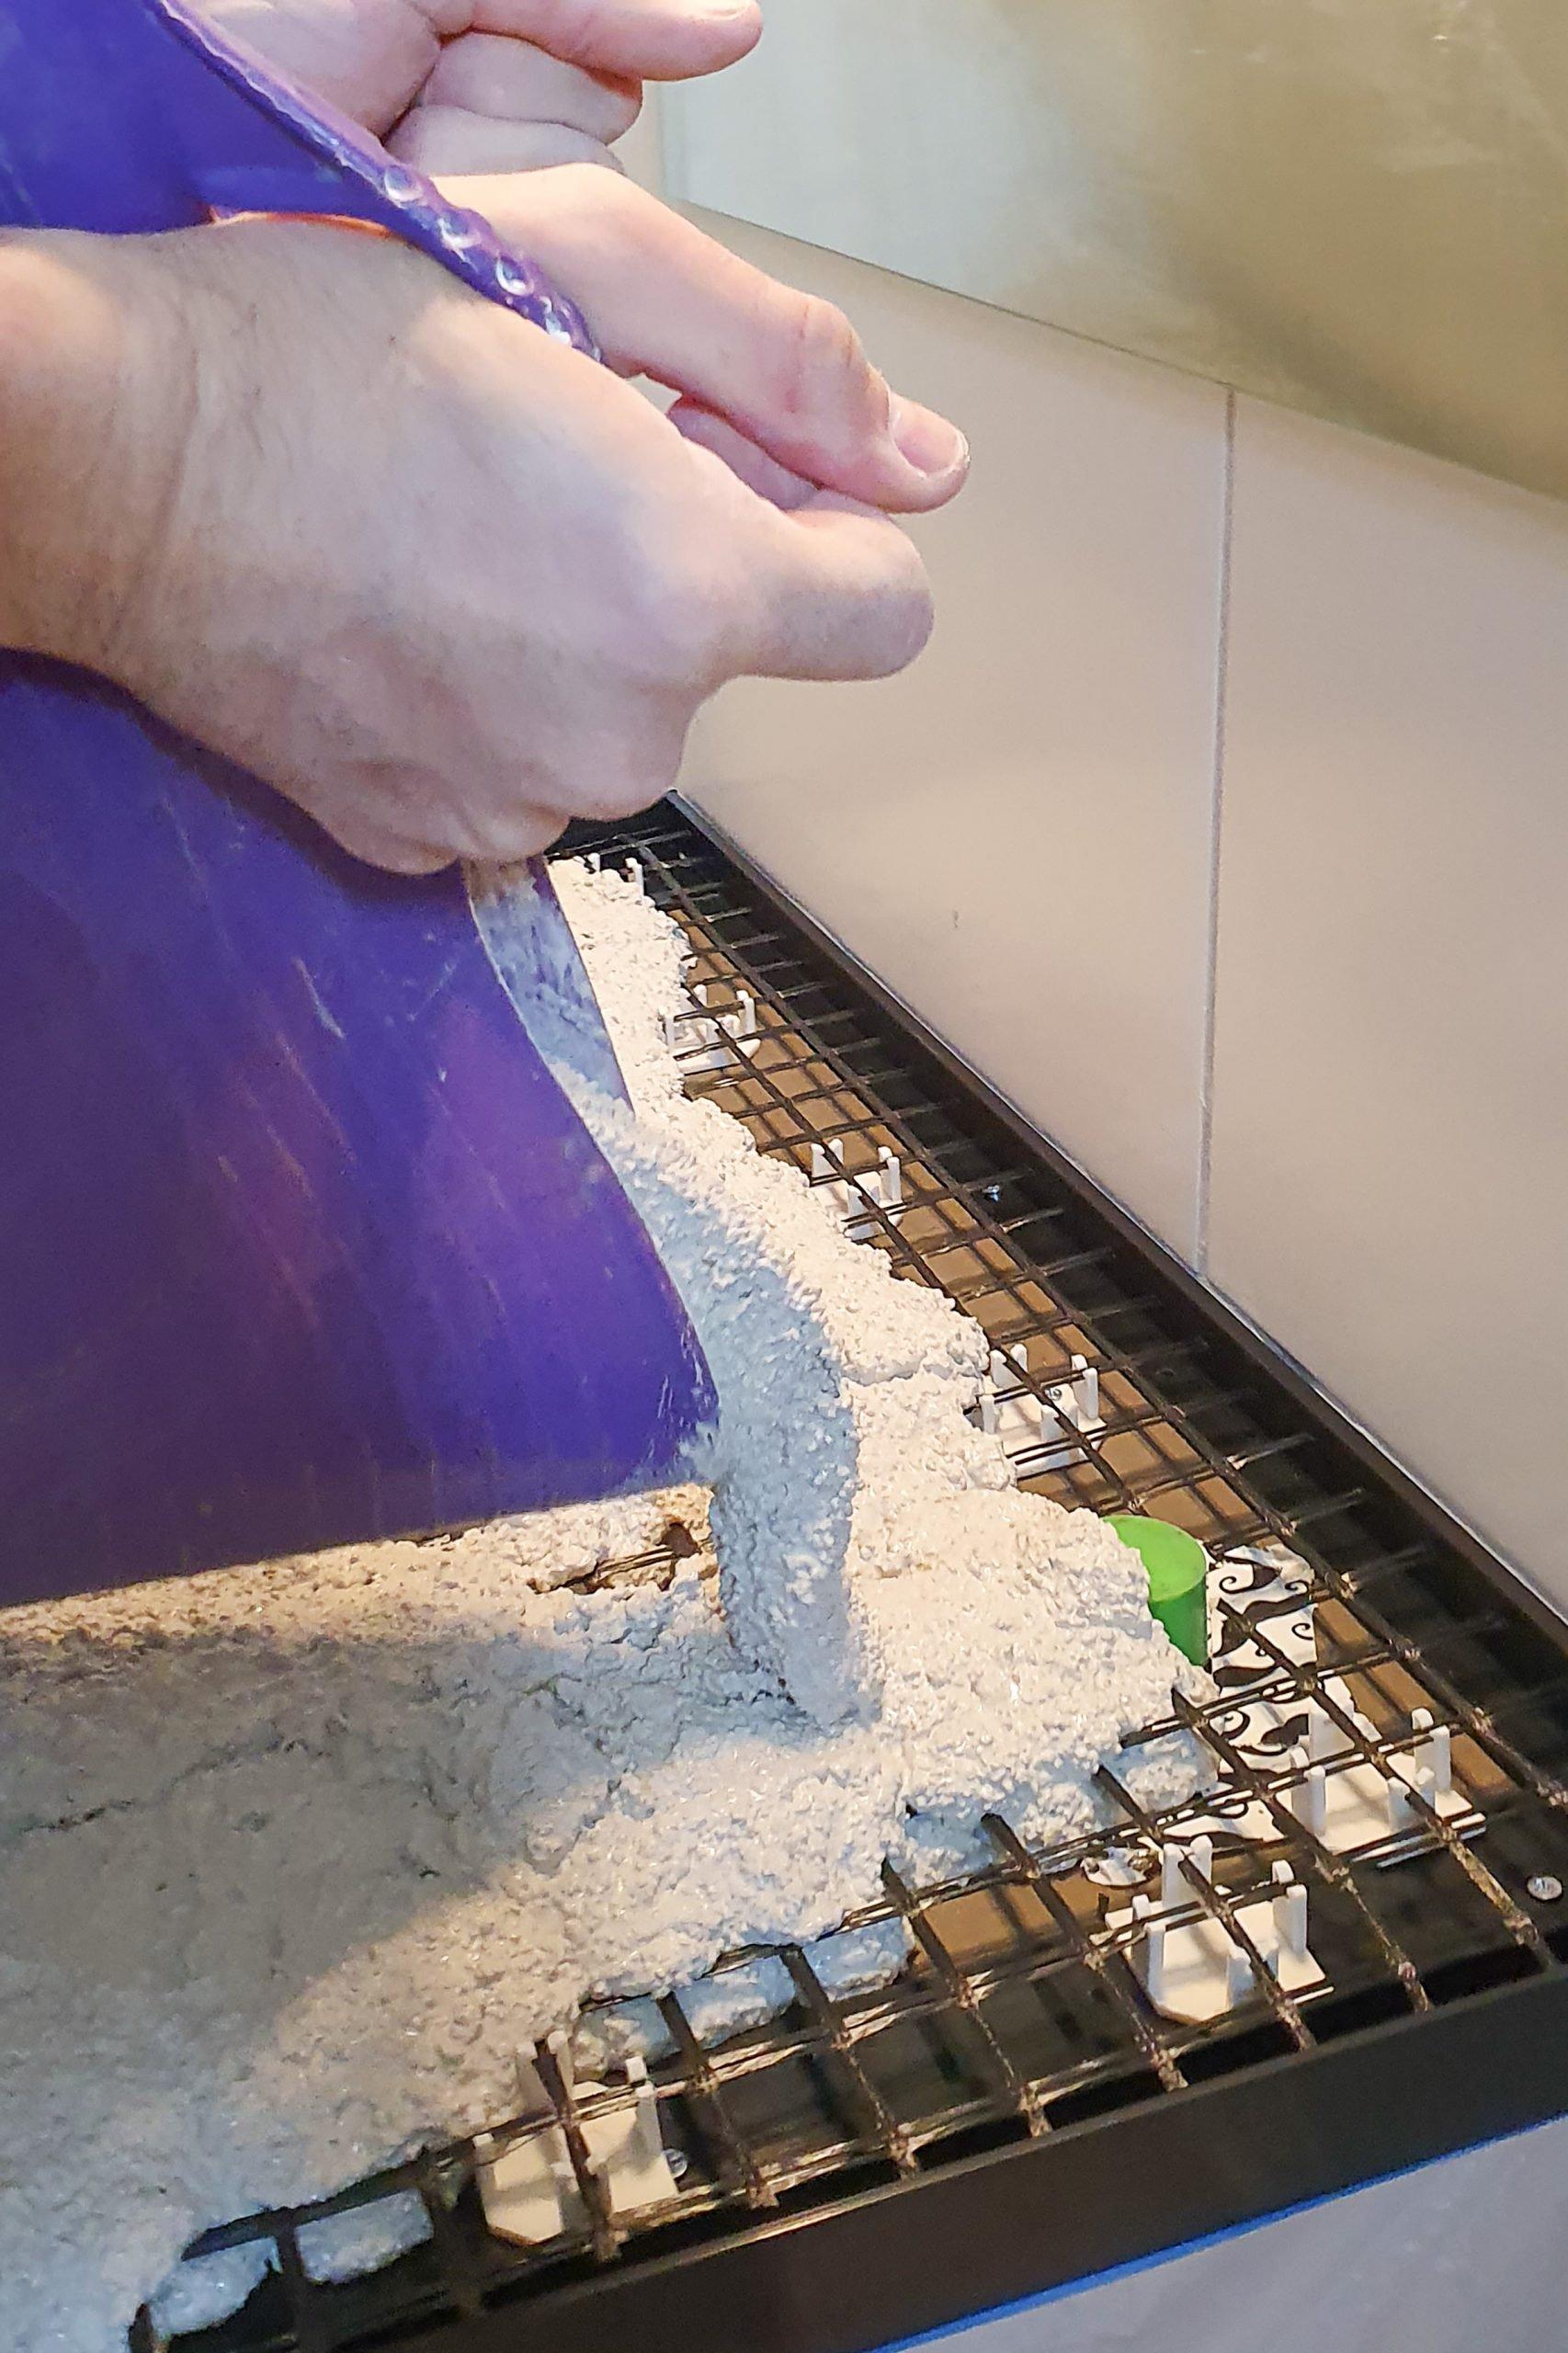 DIY Concrete Countertop - Pouring The Concrete | Little House On The Corner